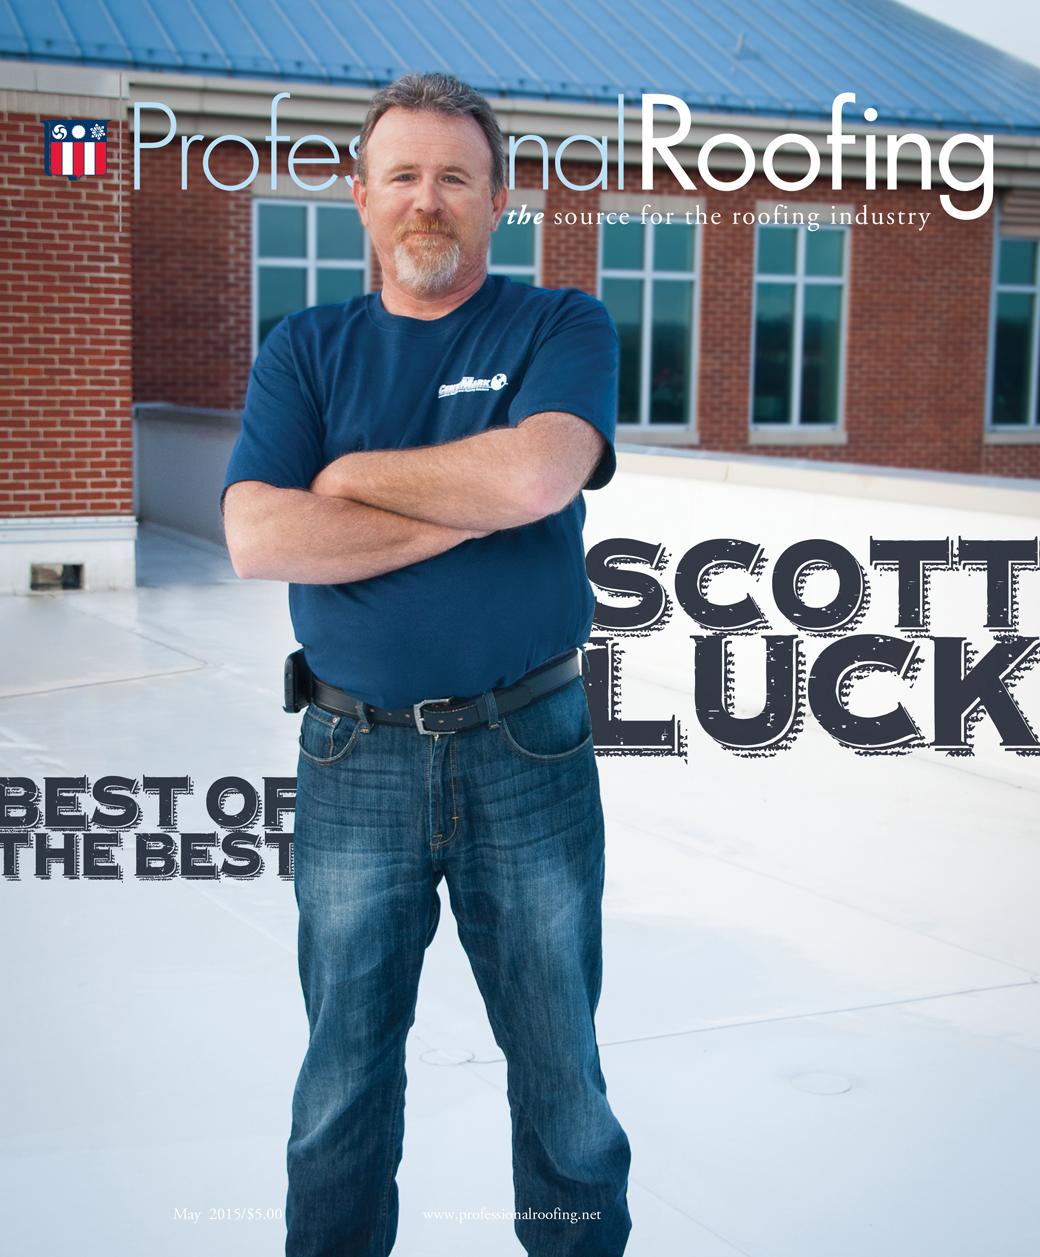 Professional Roofing Magazine 5/1/2015